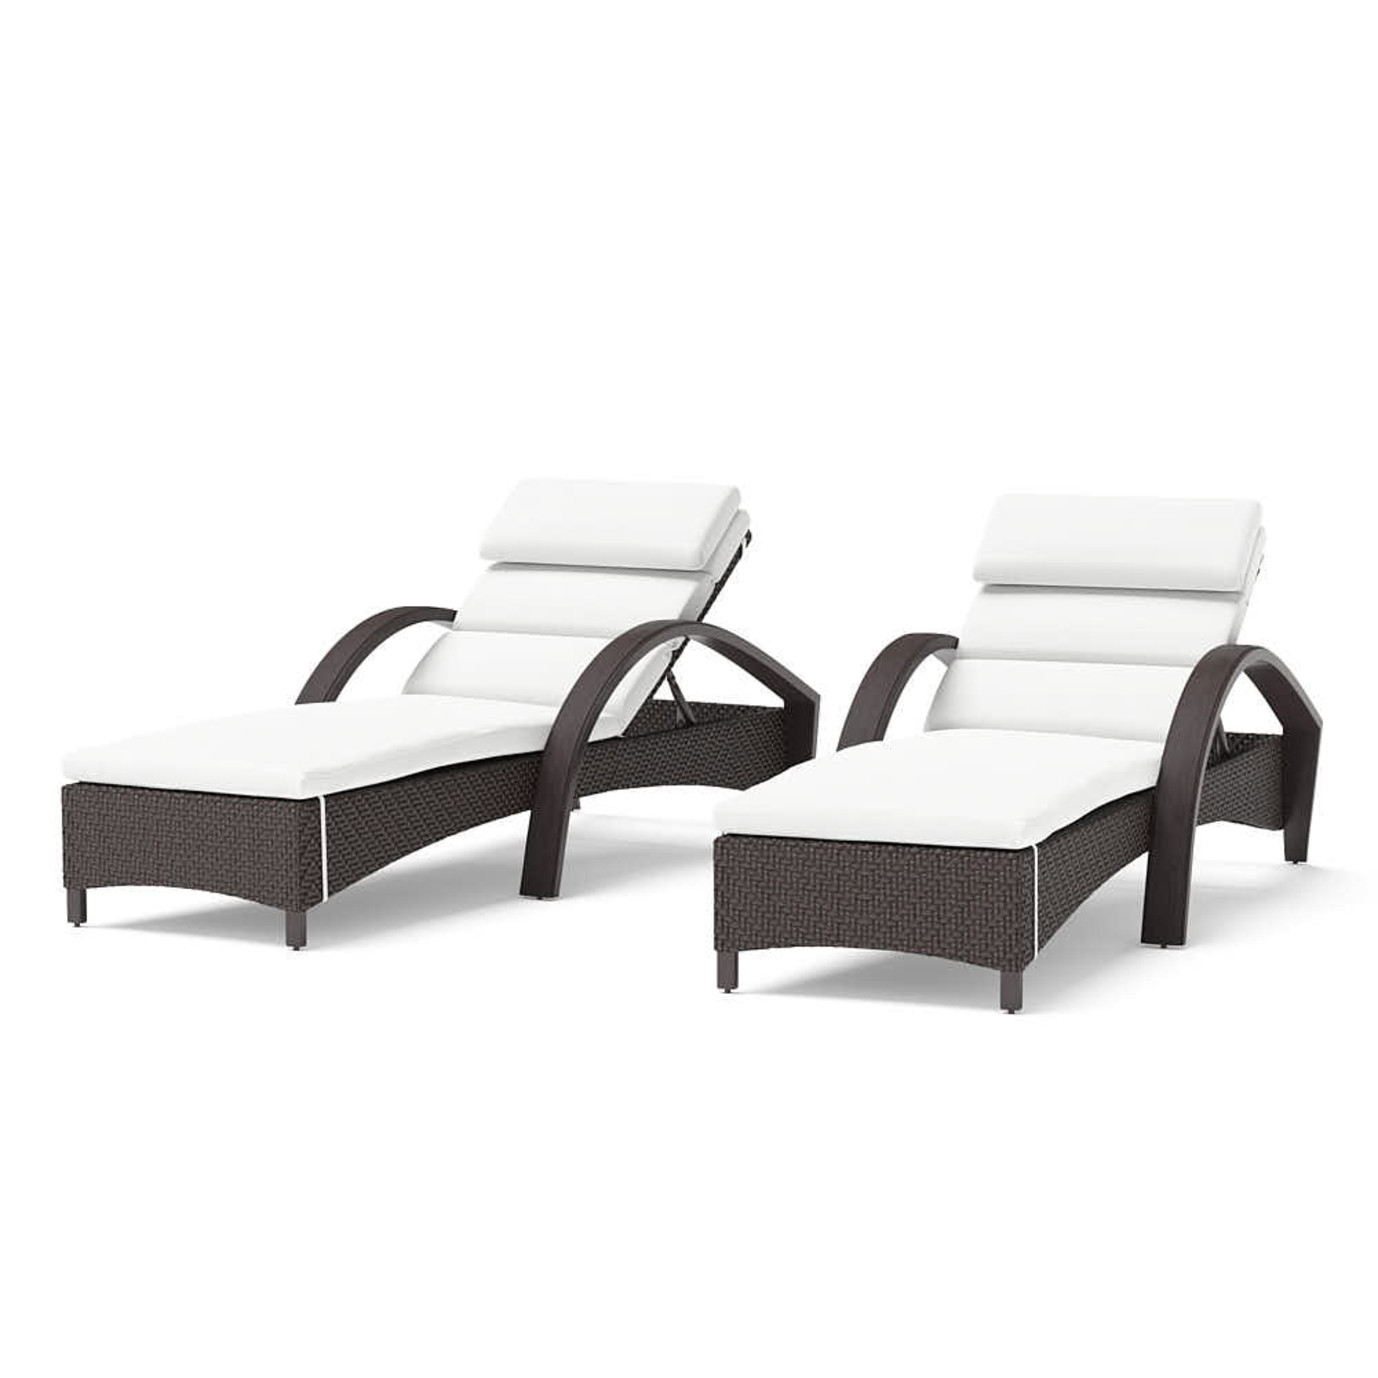 Barcelo™ Chaise Lounge 2pk